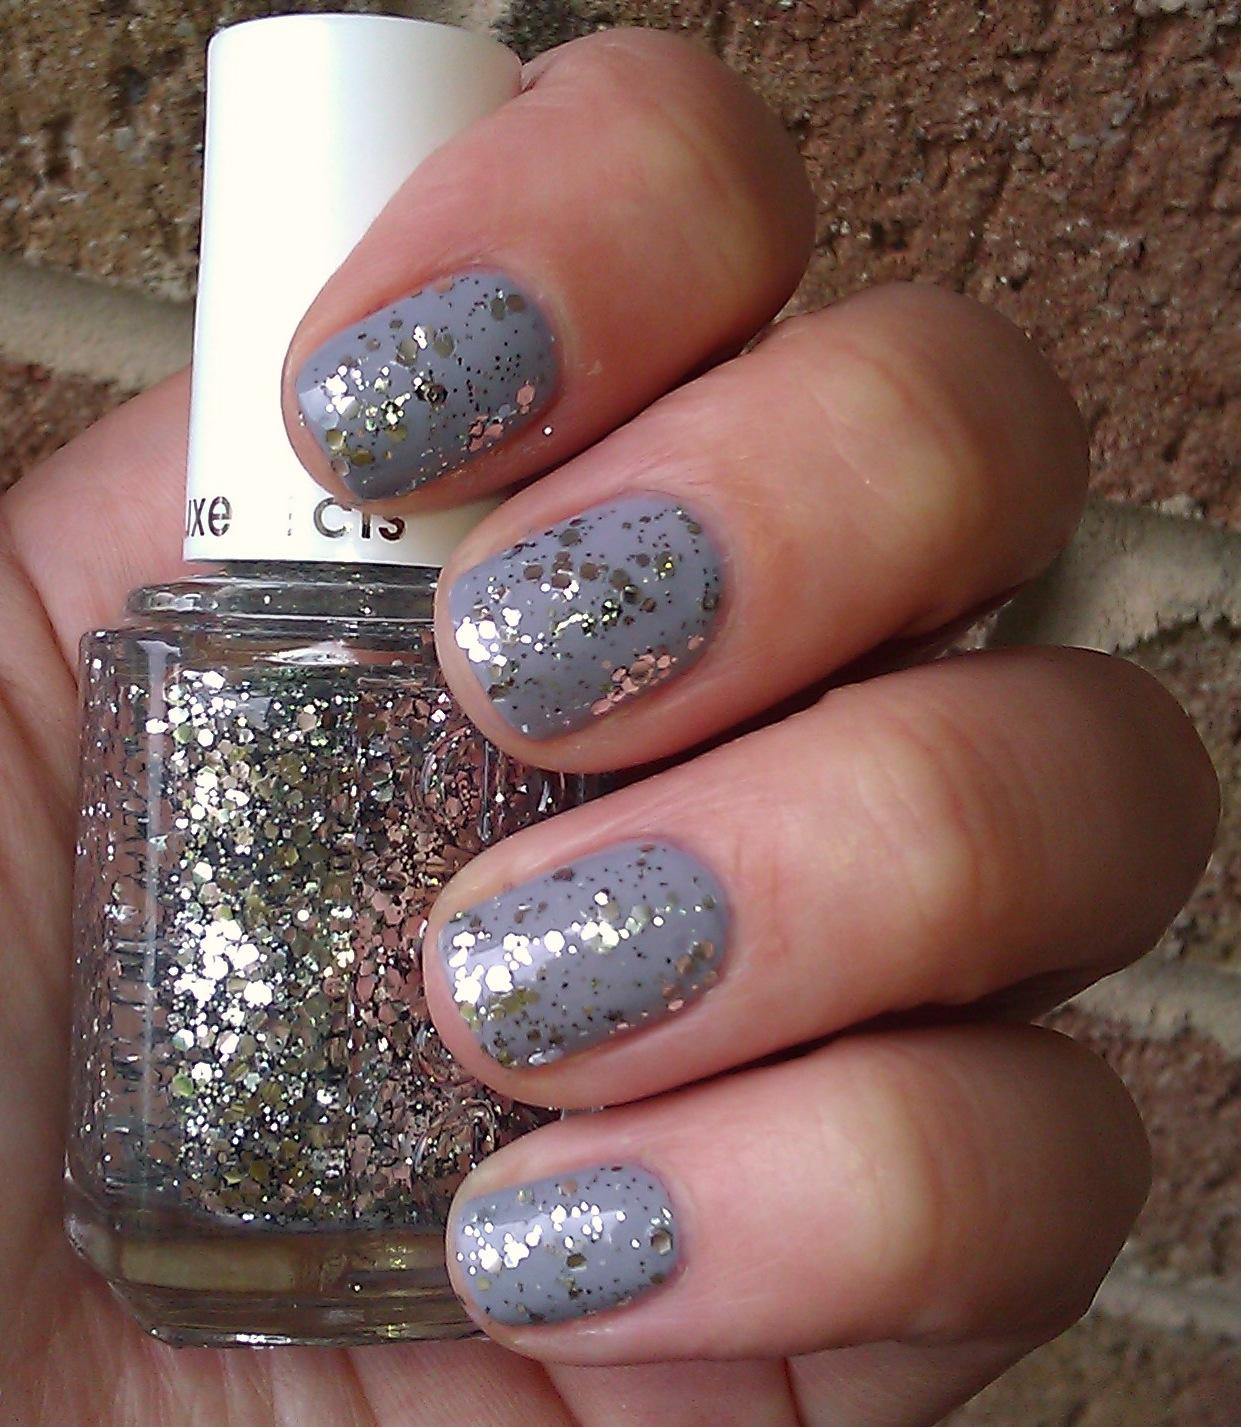 Polish or Perish: Silver Sparkle - Essie Set in Stones